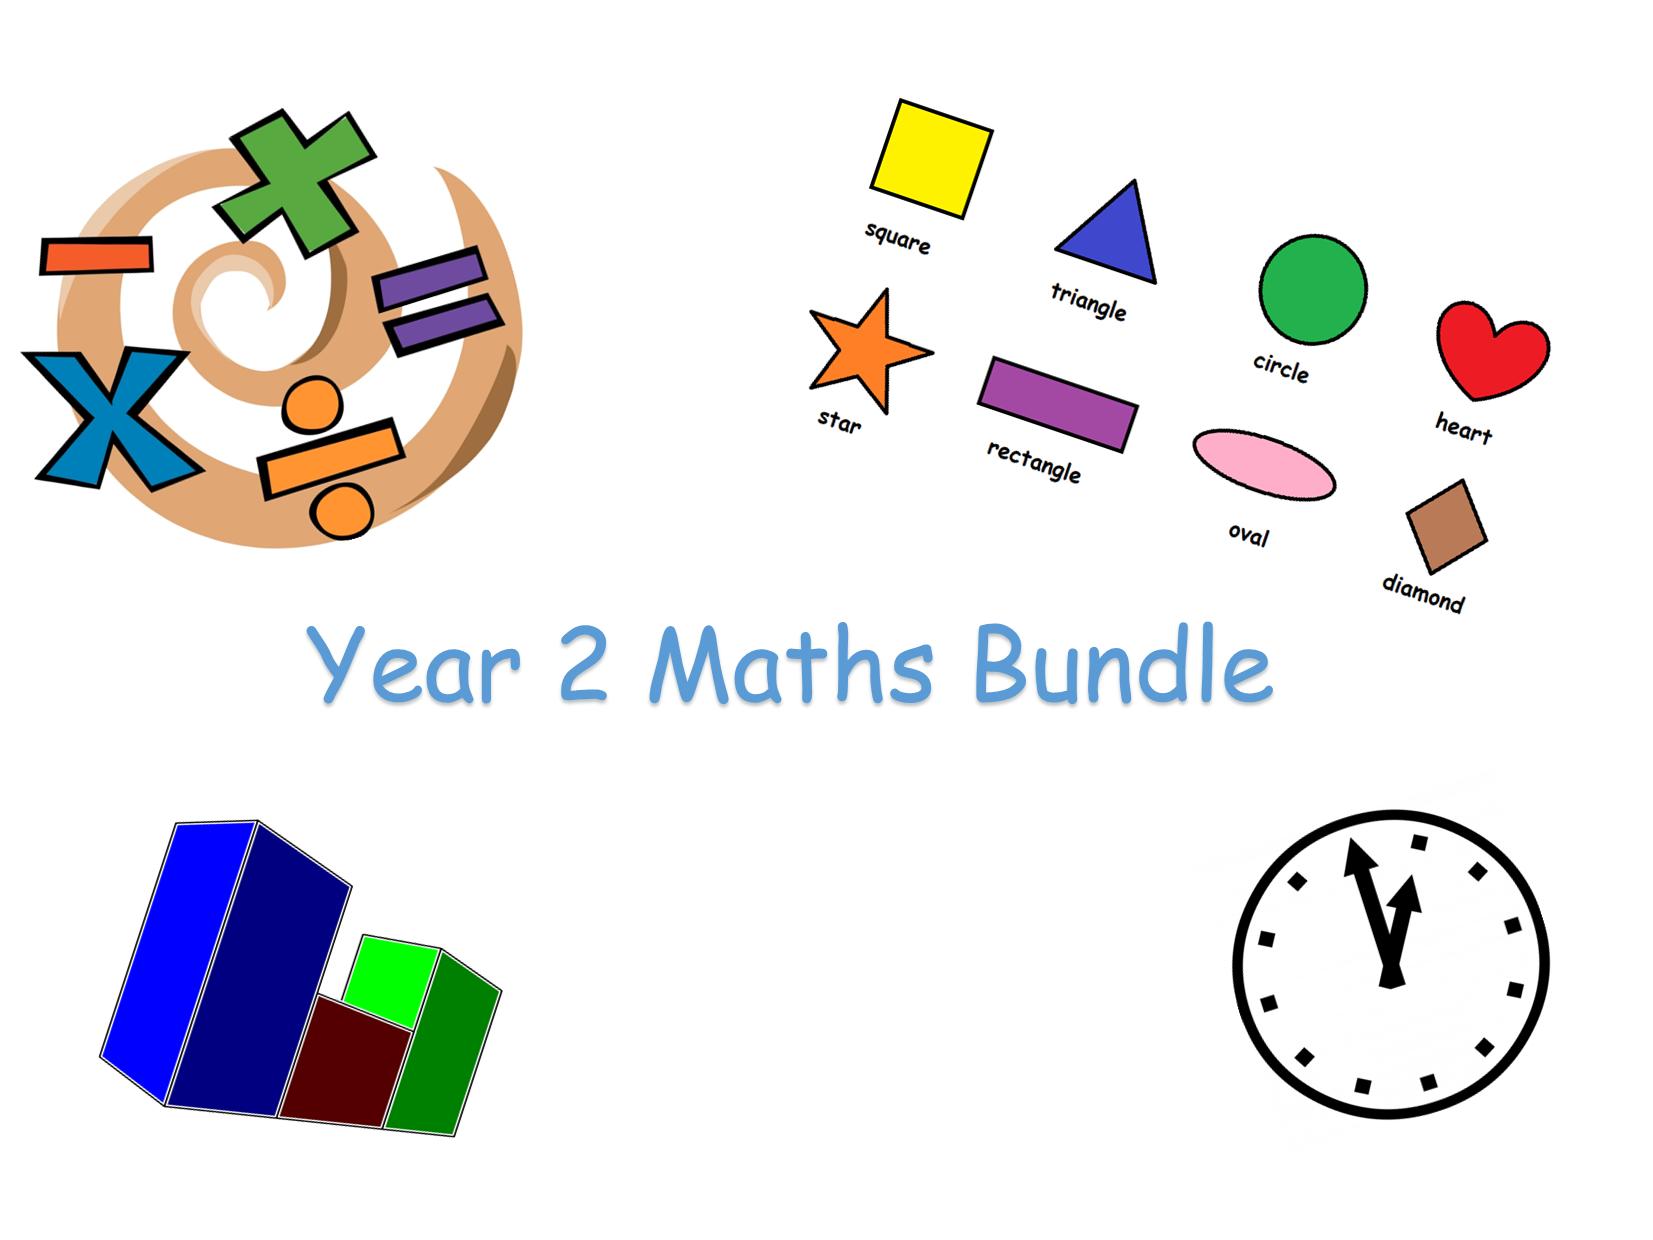 Year 2 Maths Bundle